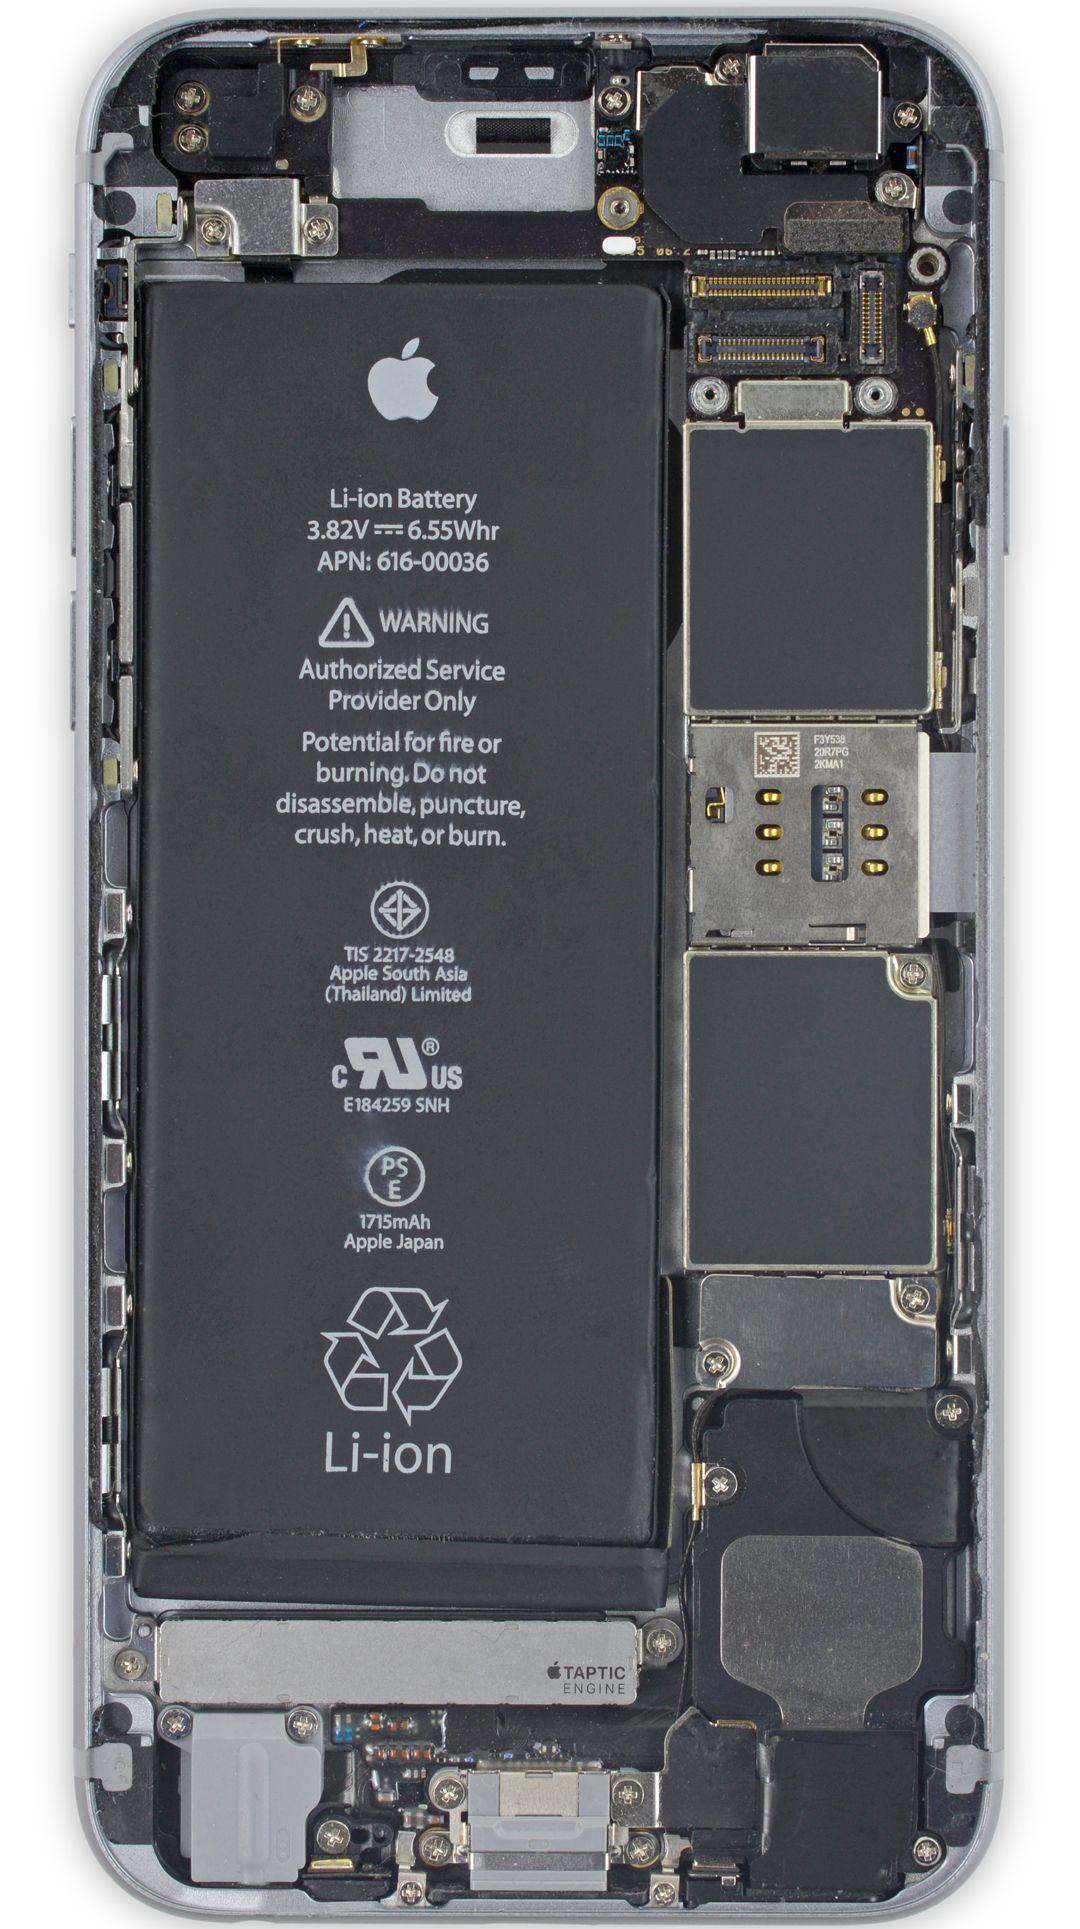 Iphone6 Wallpaper Ponsel Kertas Dinding Teknologi